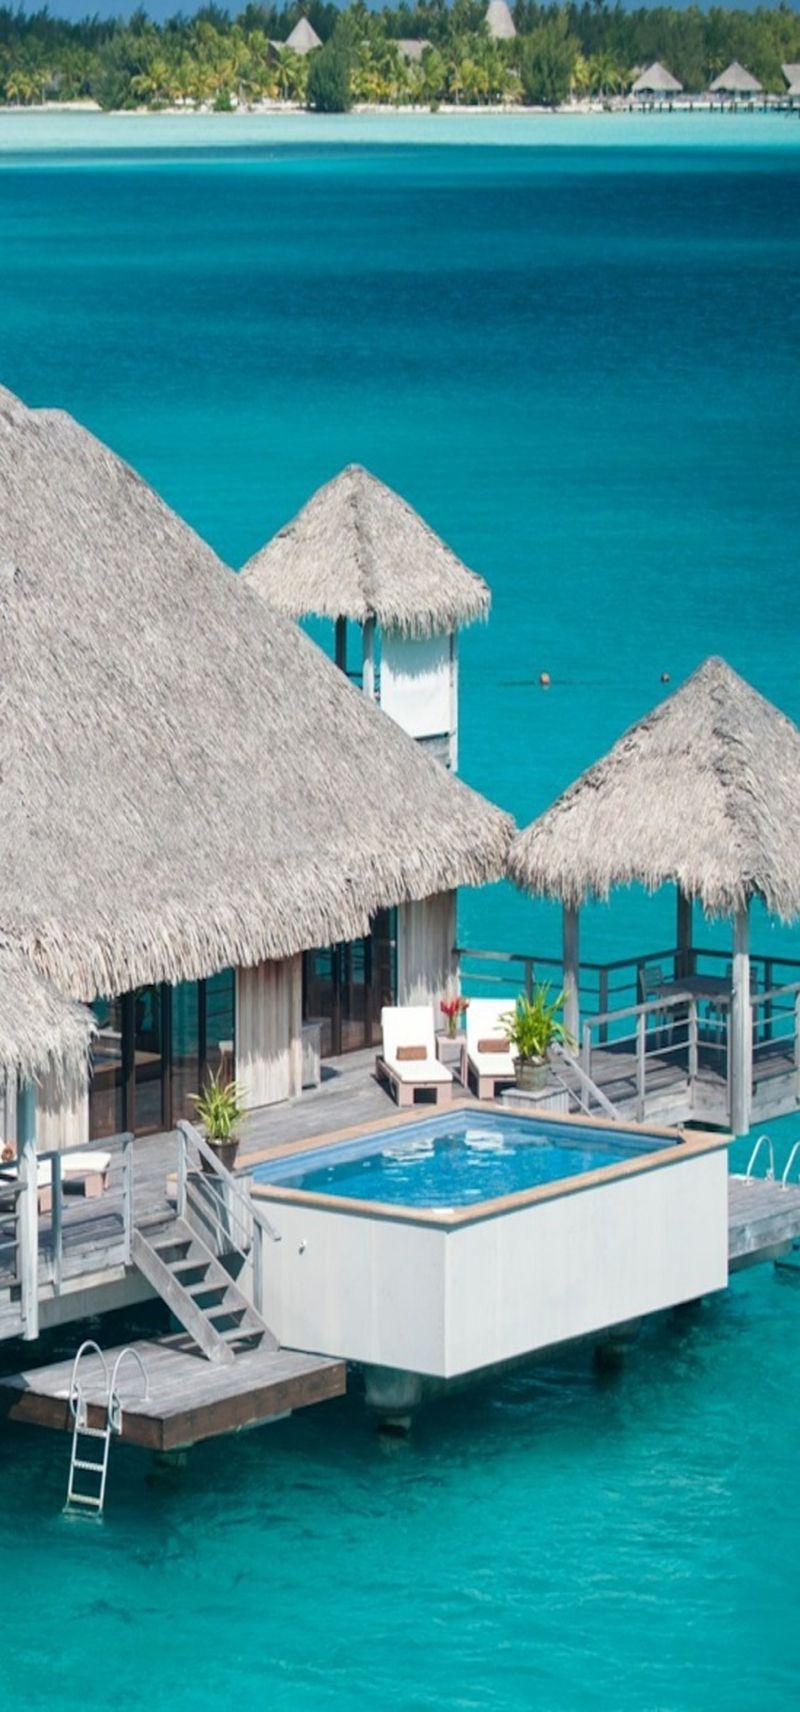 image: Ocean House at St. Regis, Bora Bora by nanalogia